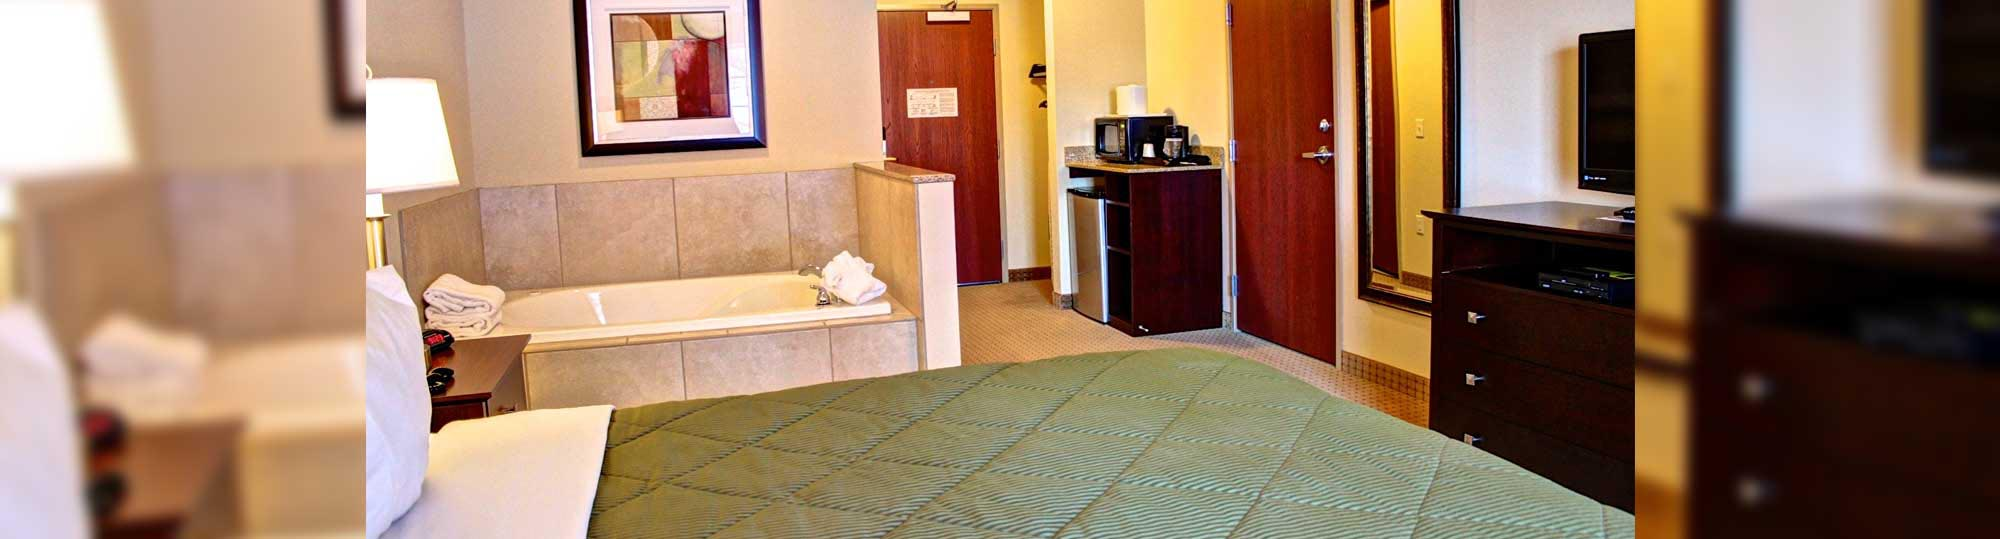 Cobblestone Inn and Suites Durand